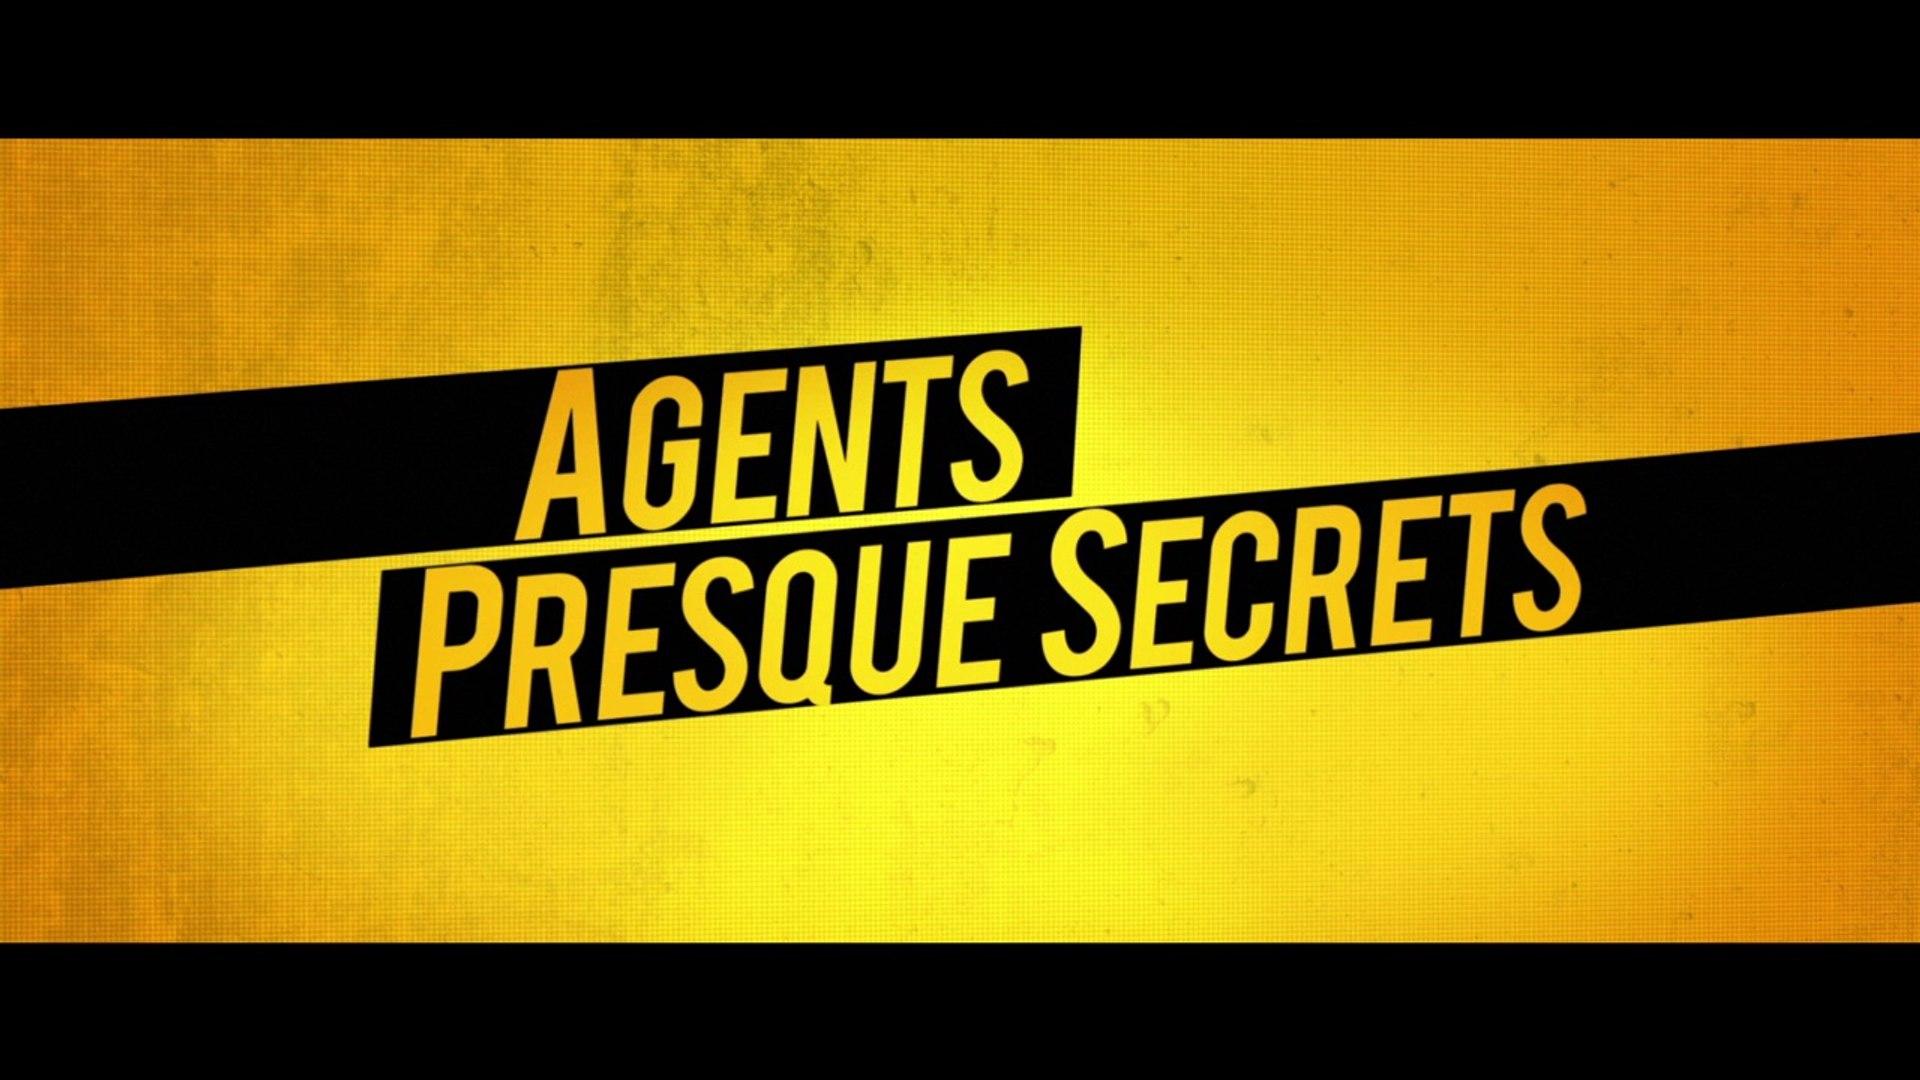 Agents Presque Secrets (2016) Bande Annonce VF - HD